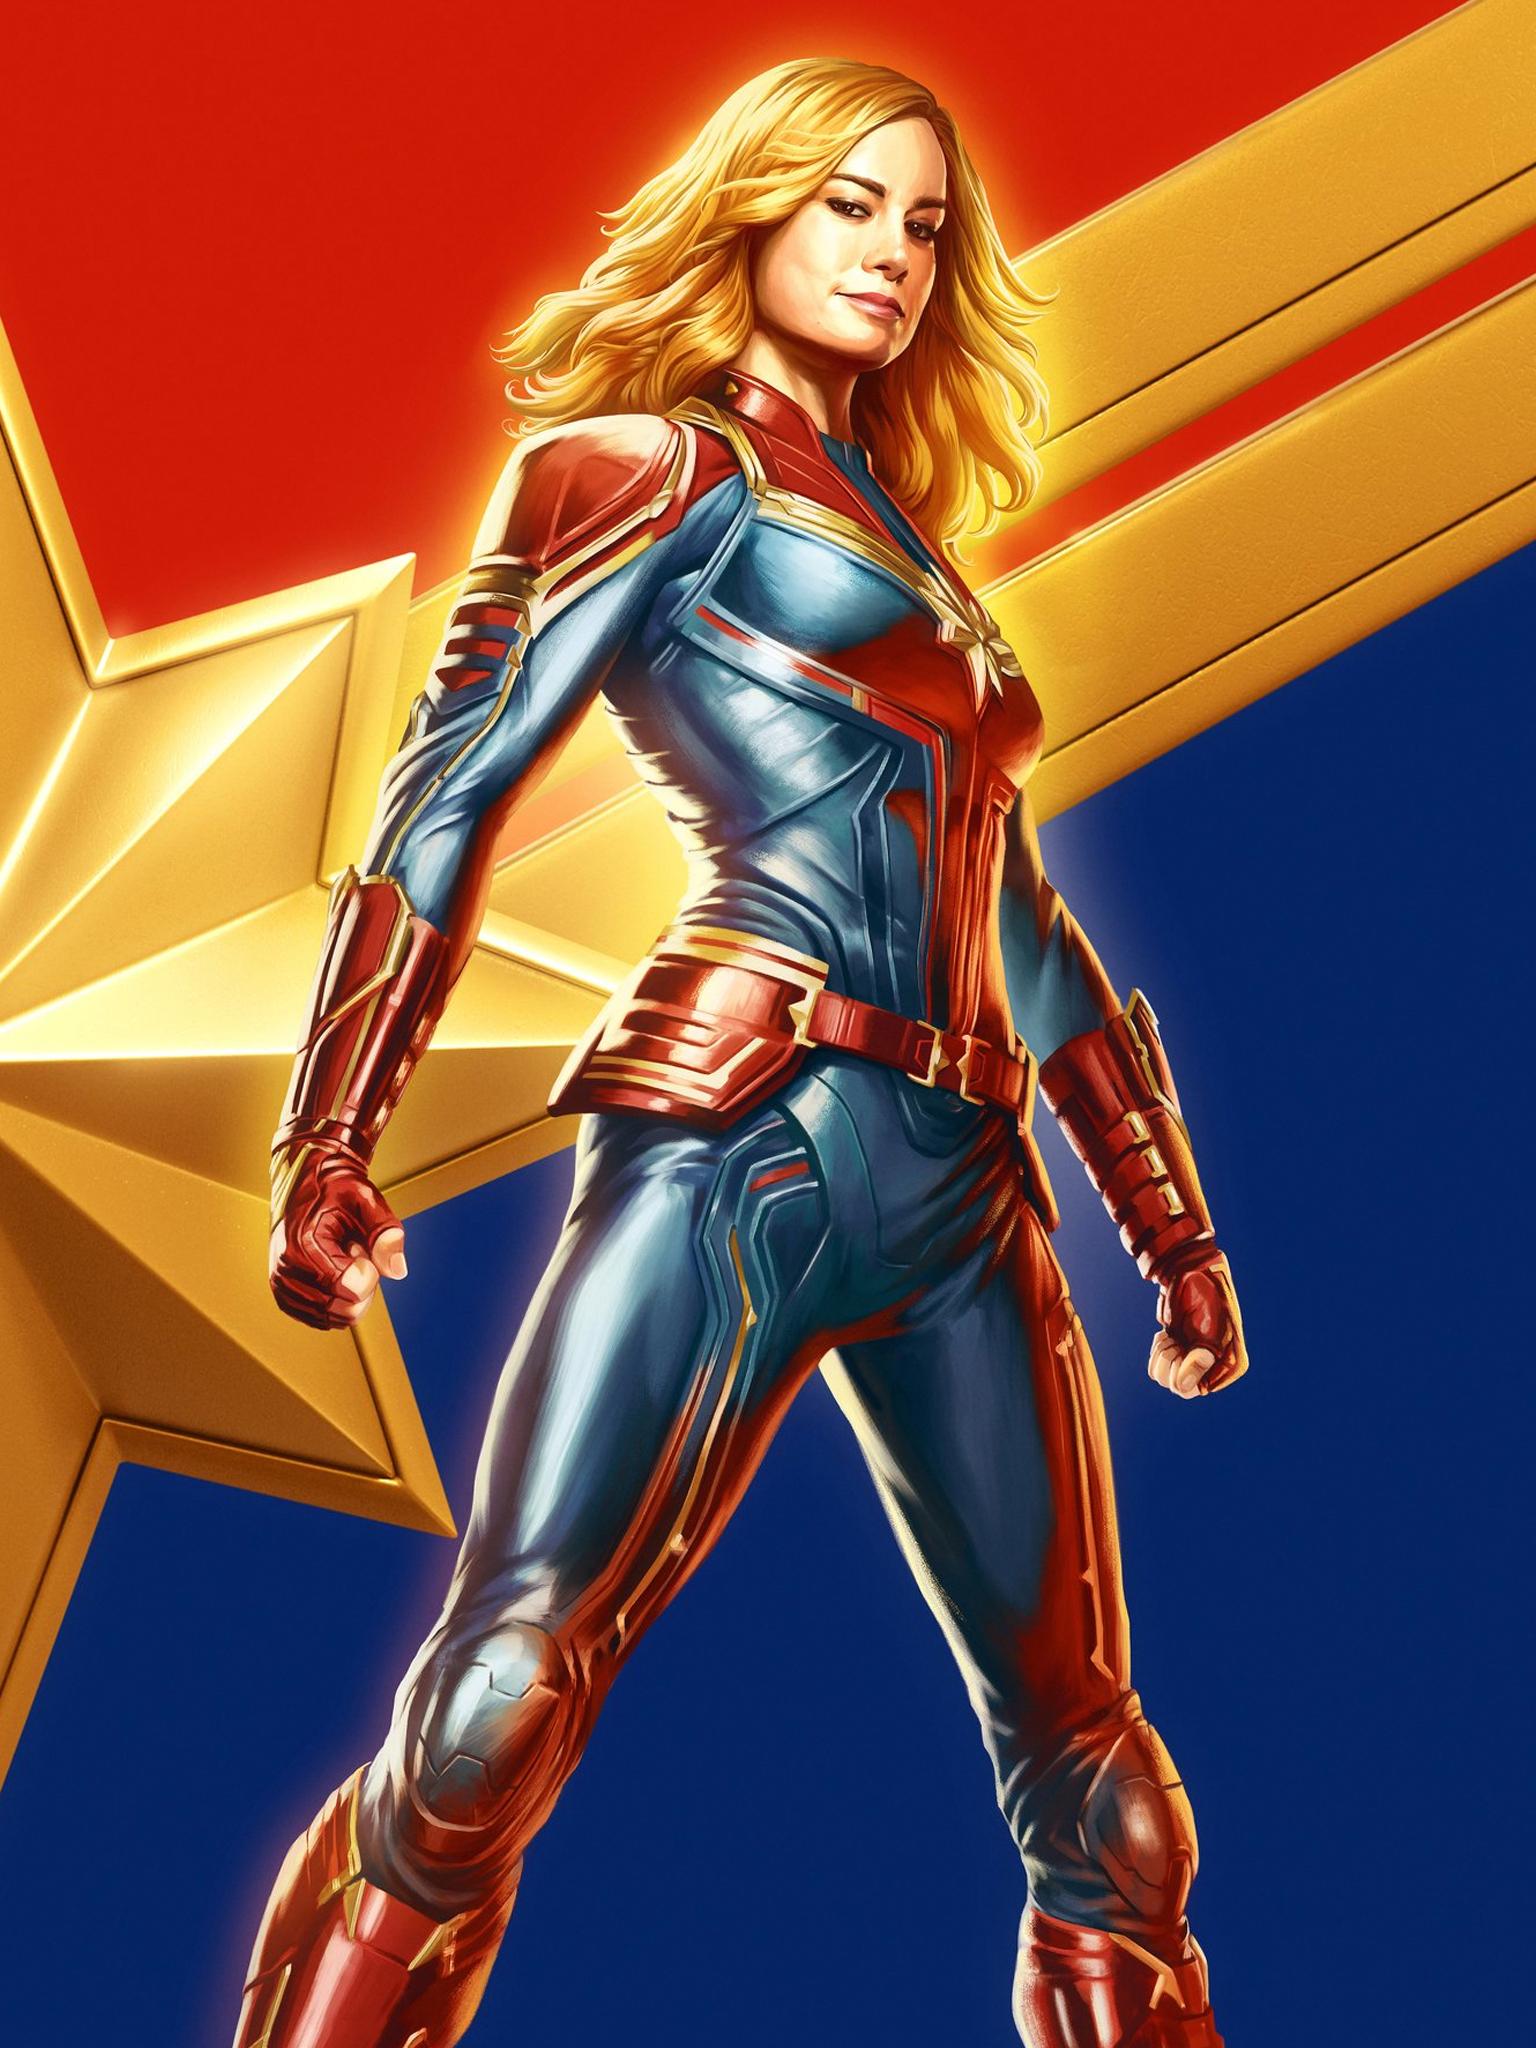 Wallpaper 1366x768 Hd Car Wallpaper Captain Marvel Marvel Cinematic Universe